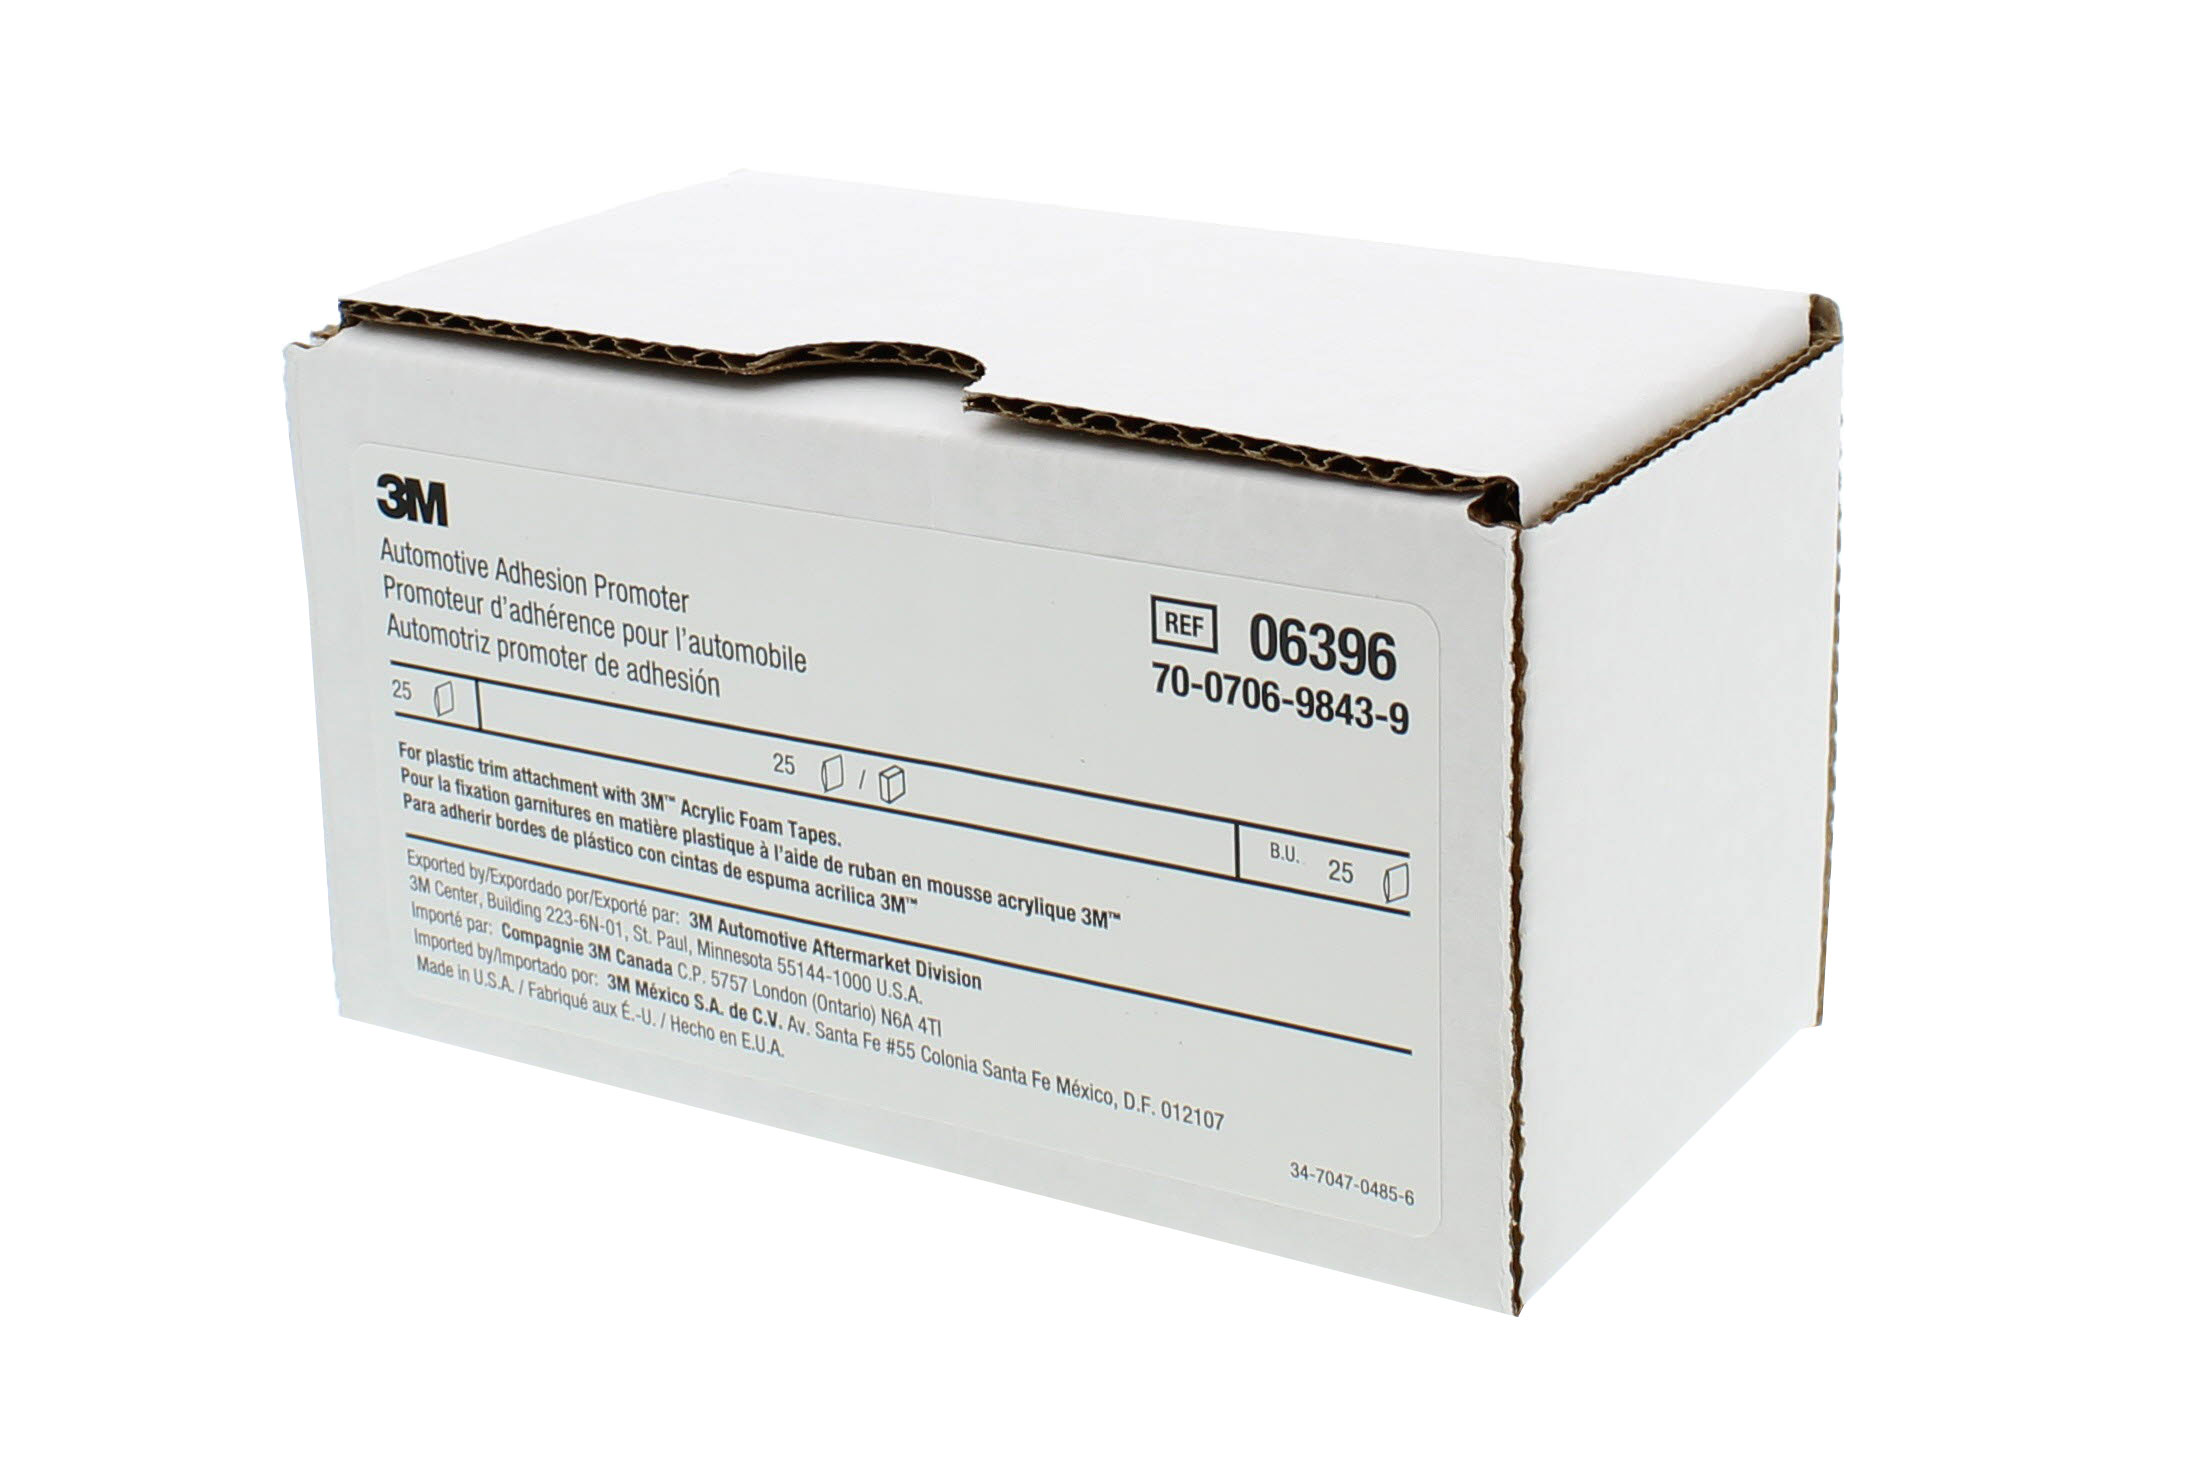 06396 10 single packets 2.5 cc 3M™ 6396 Adhesion Promoter Sponge Applicator